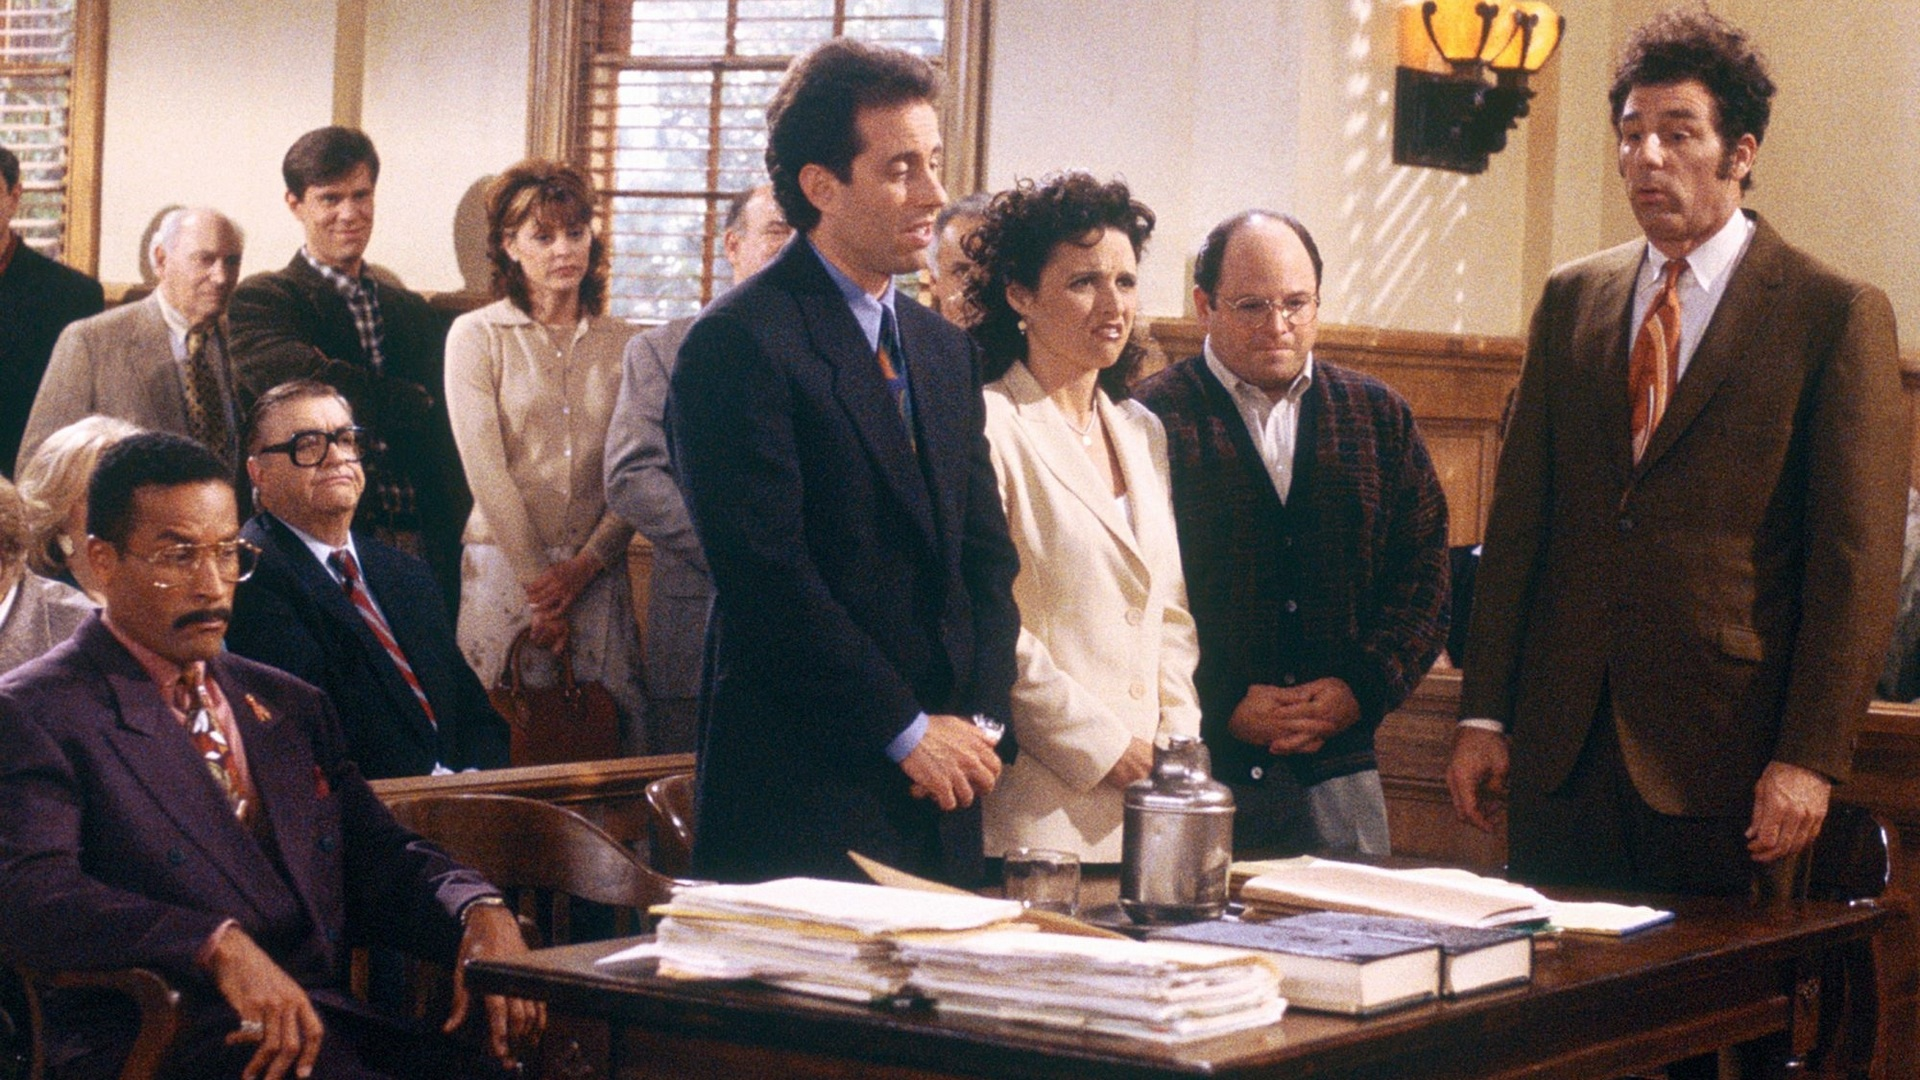 Seindfeld dolazi na Netflix | Svih 180 epizoda